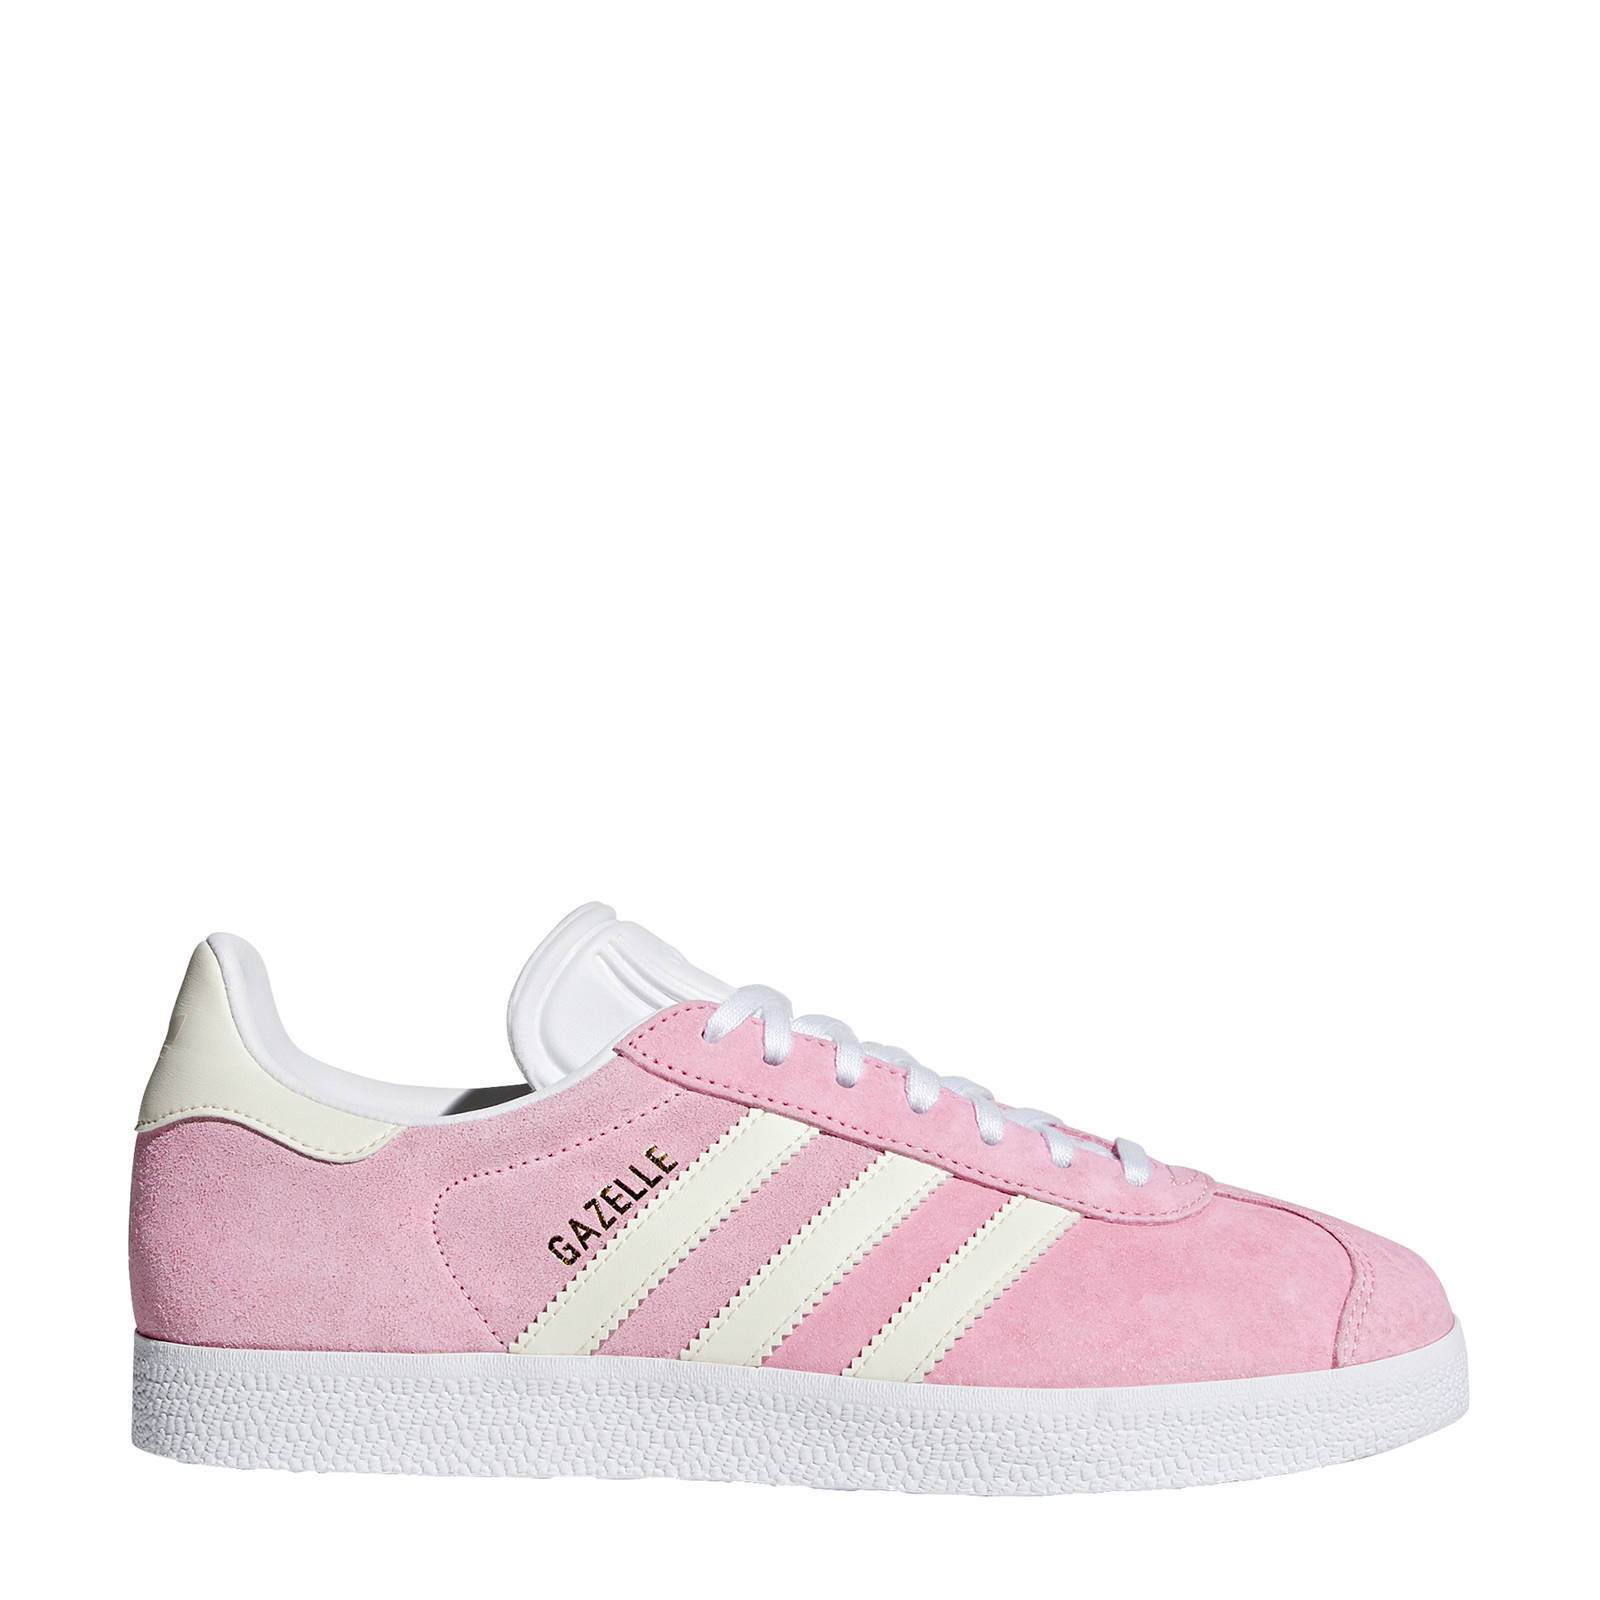 adidas gazelle roze sale